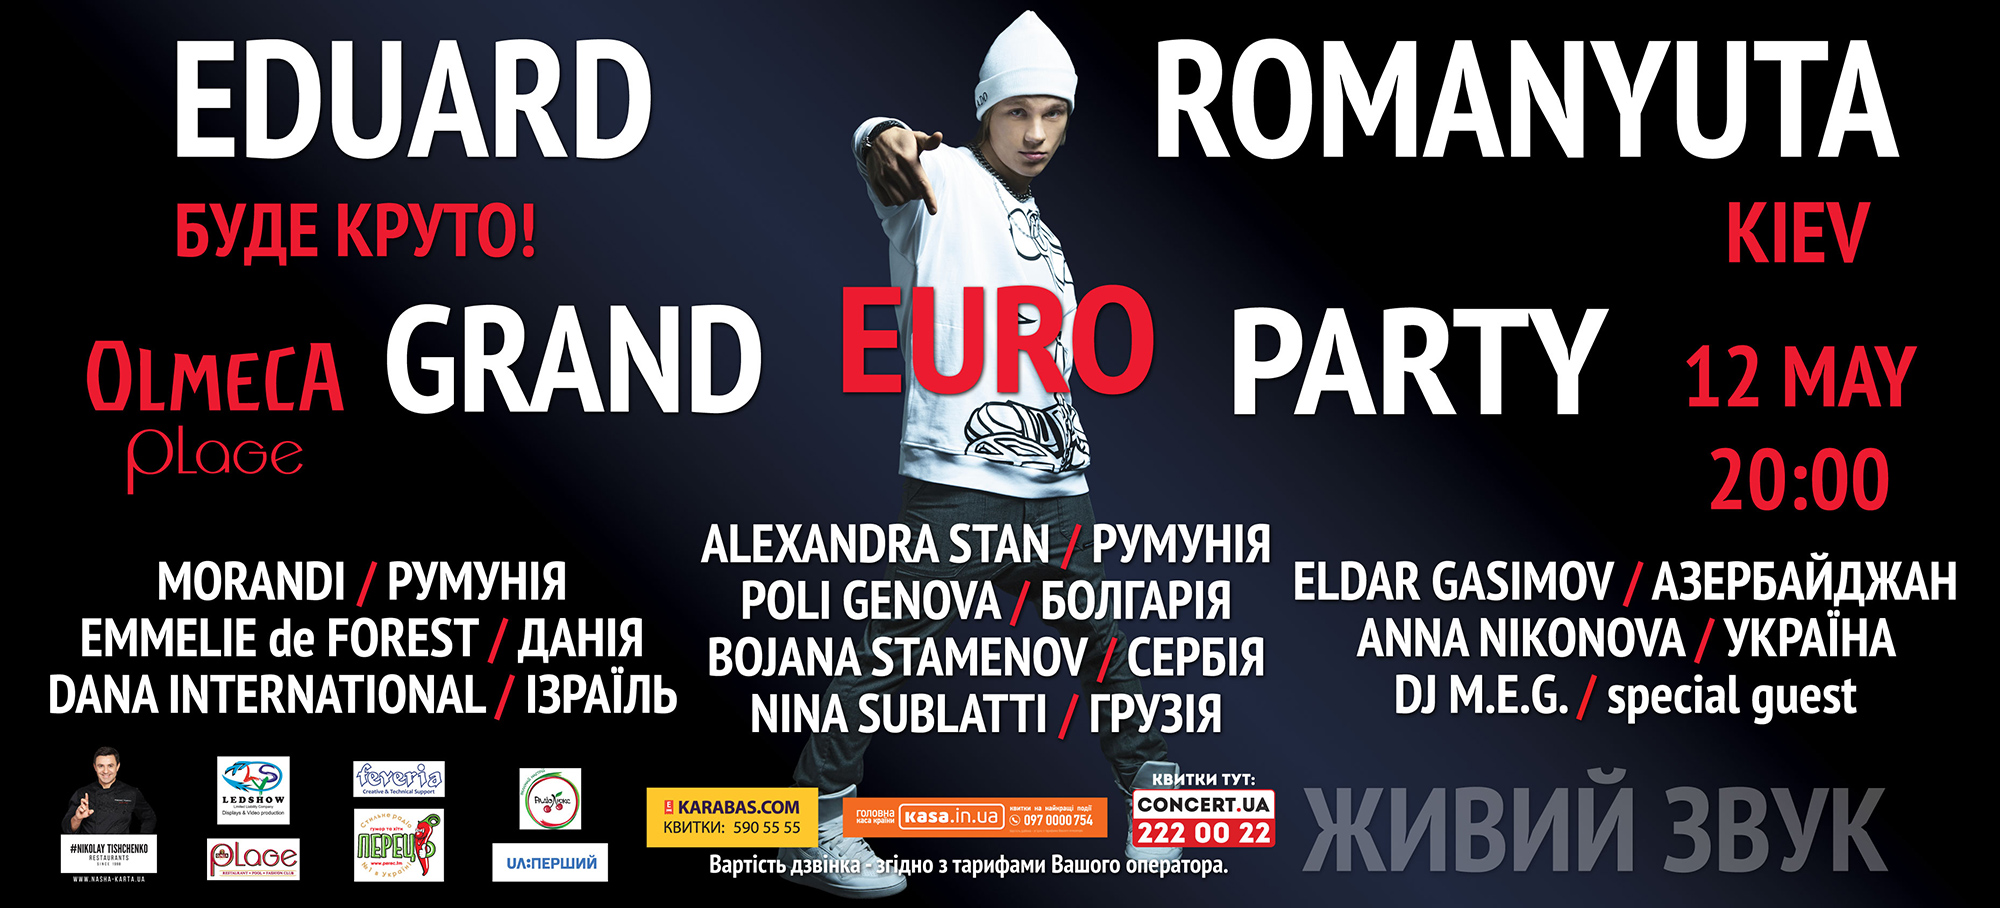 Проект GRAND EURO PARTY от Эдуарда Романюты